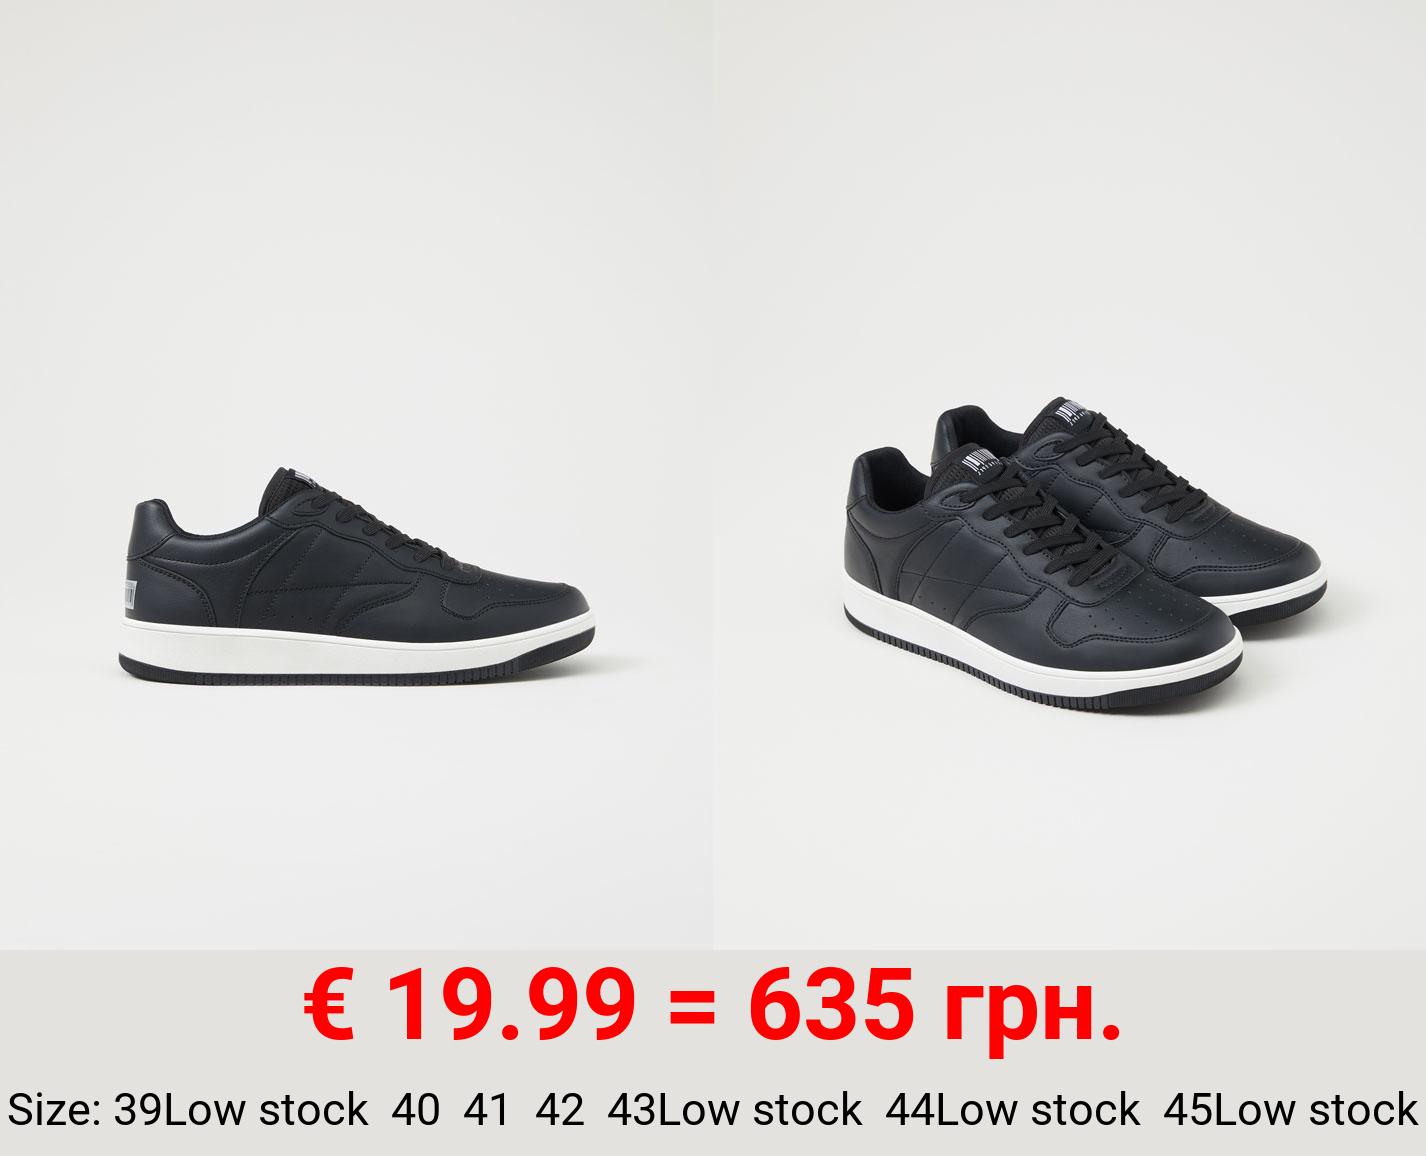 Contrast retro sneakers